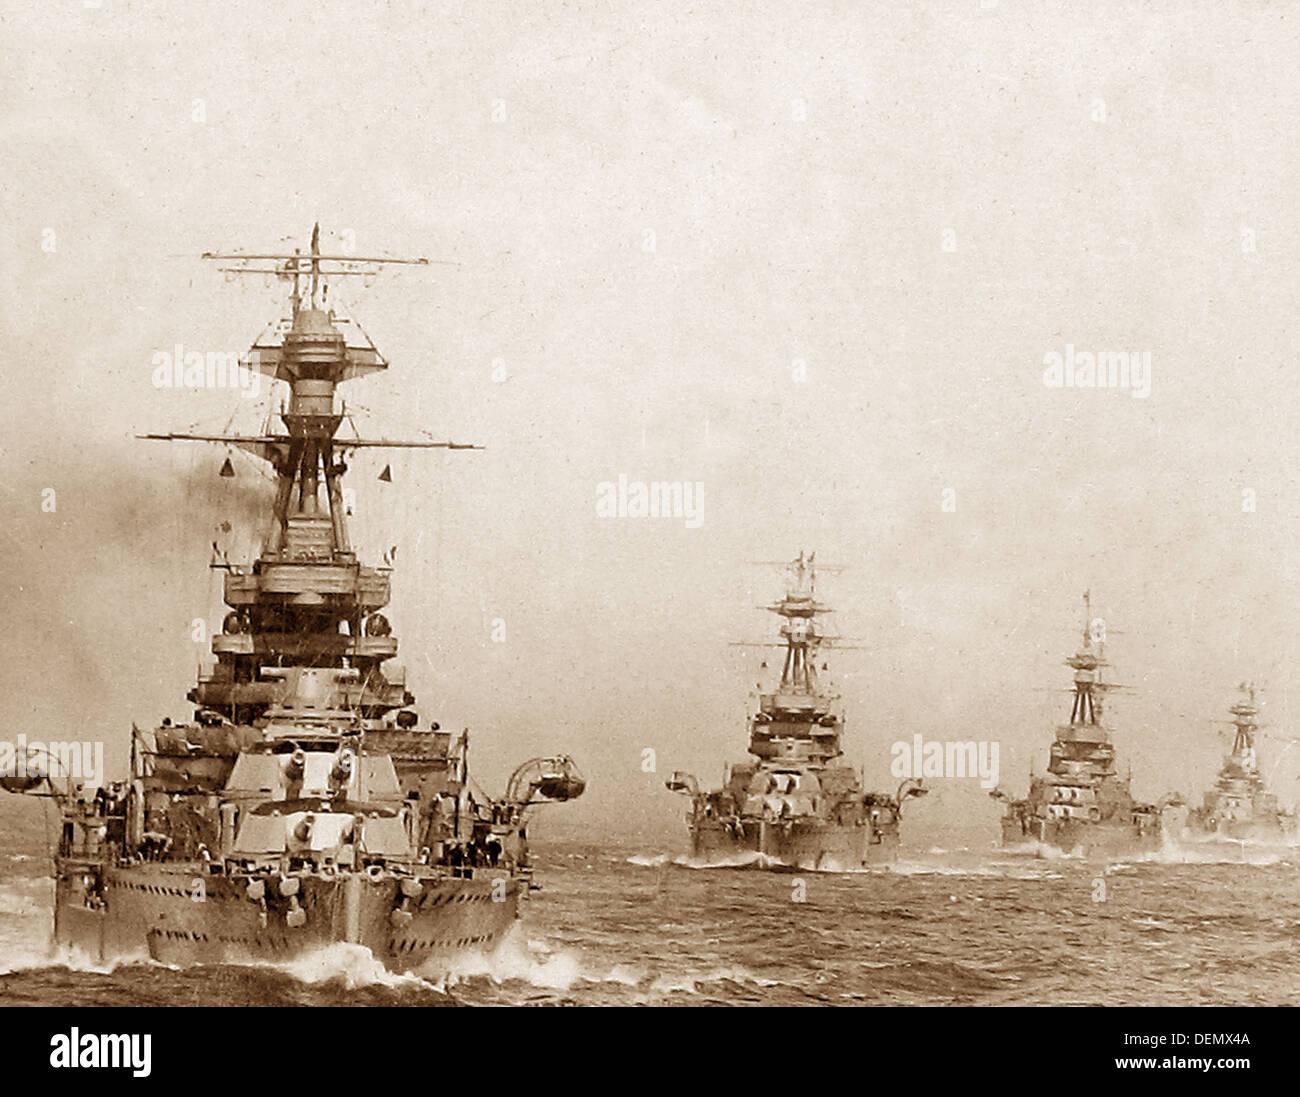 Royal Navy Battleships in Line - Stock Image